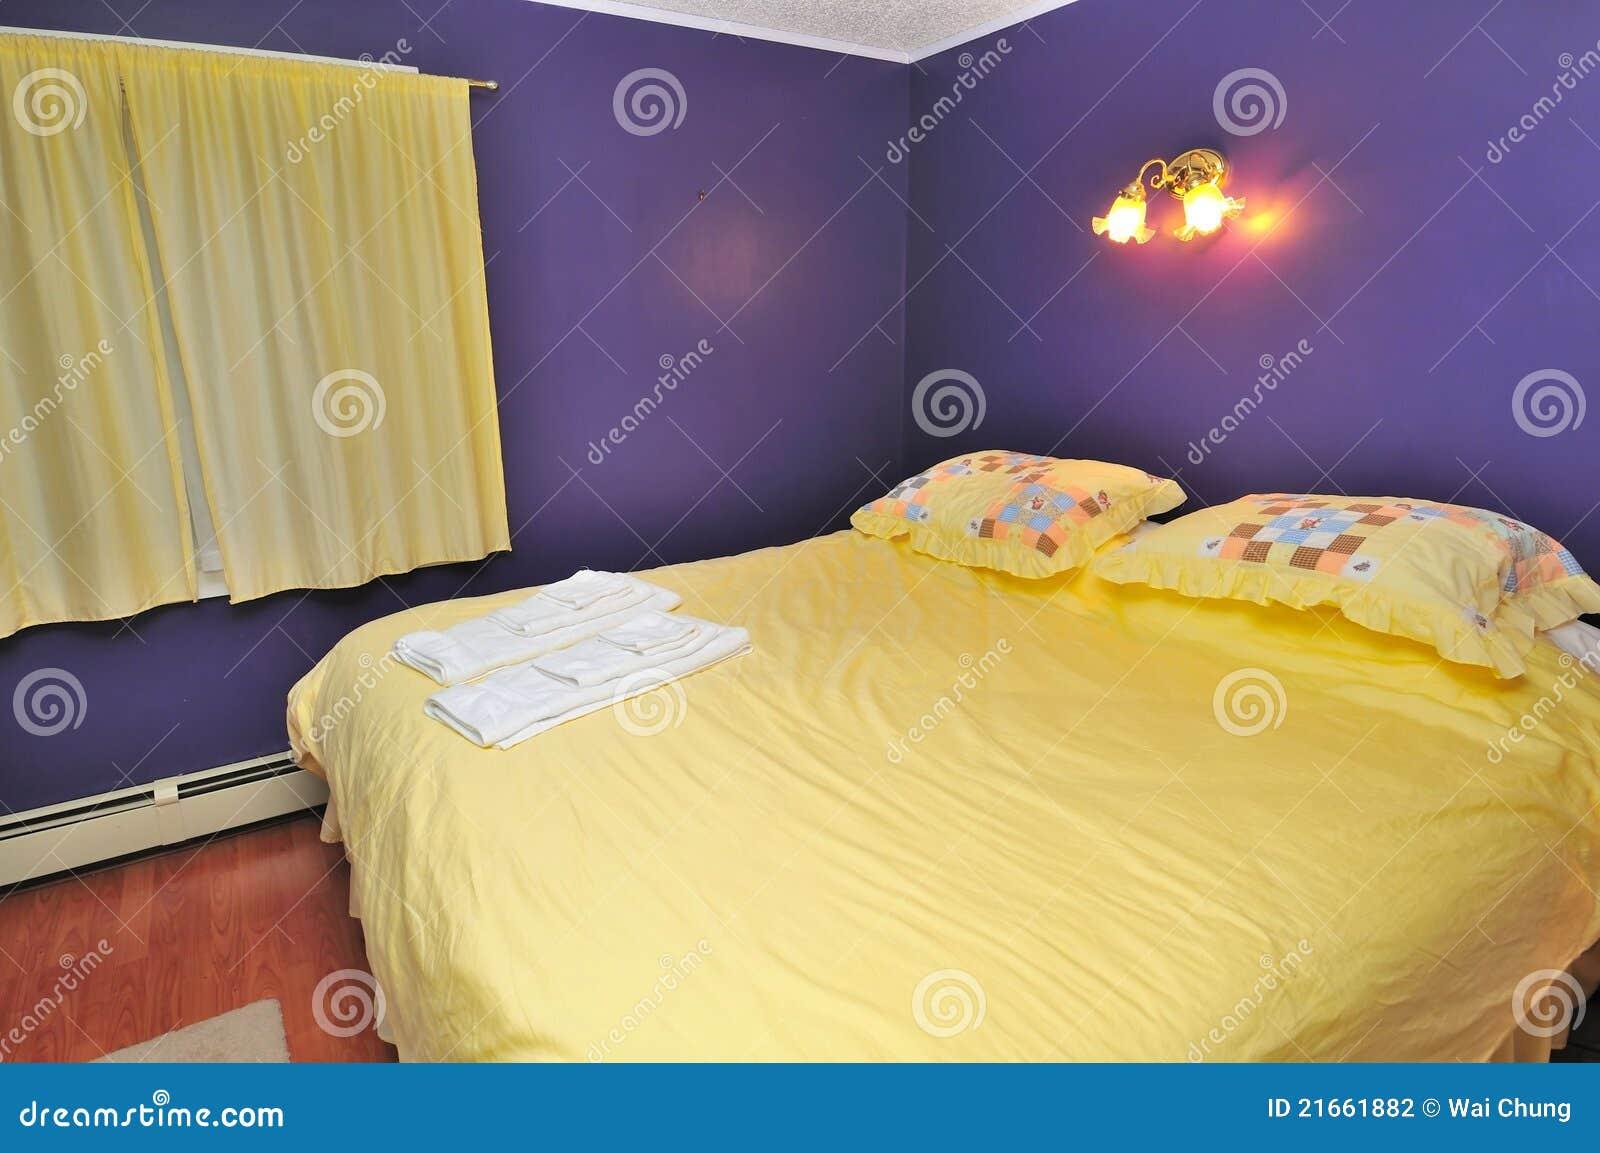 großes gelbes bett stockfotografie - bild: 21661882, Hause ideen